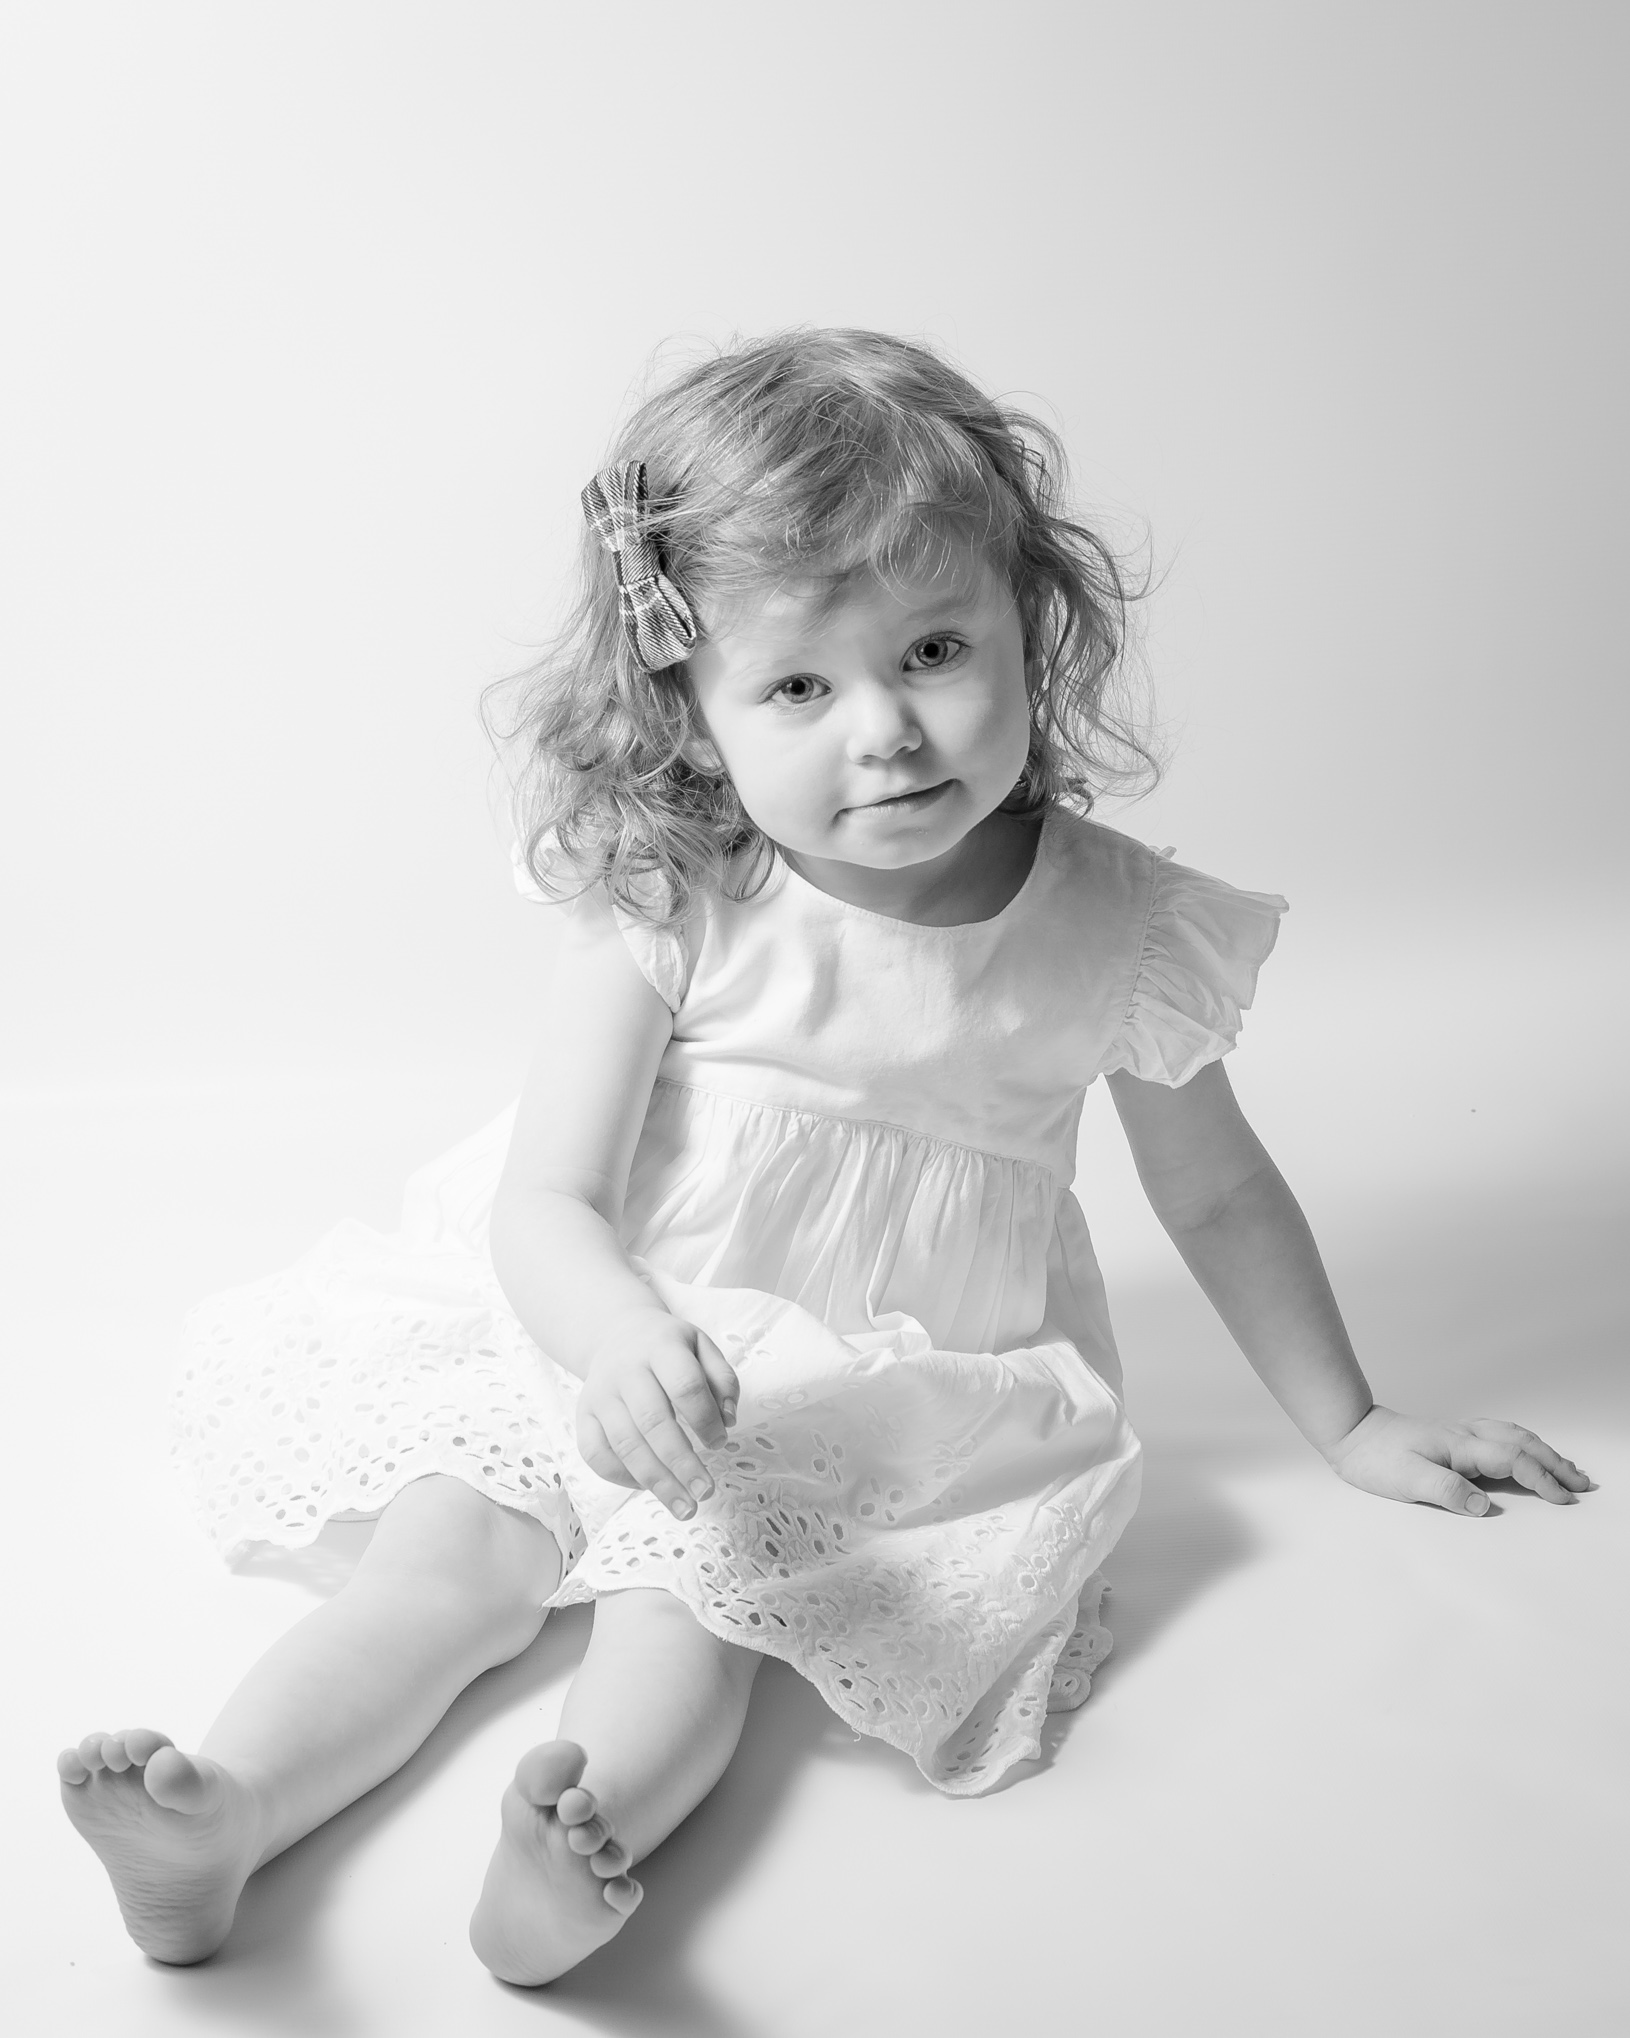 Toddler sitting in studio  | Children's Photography